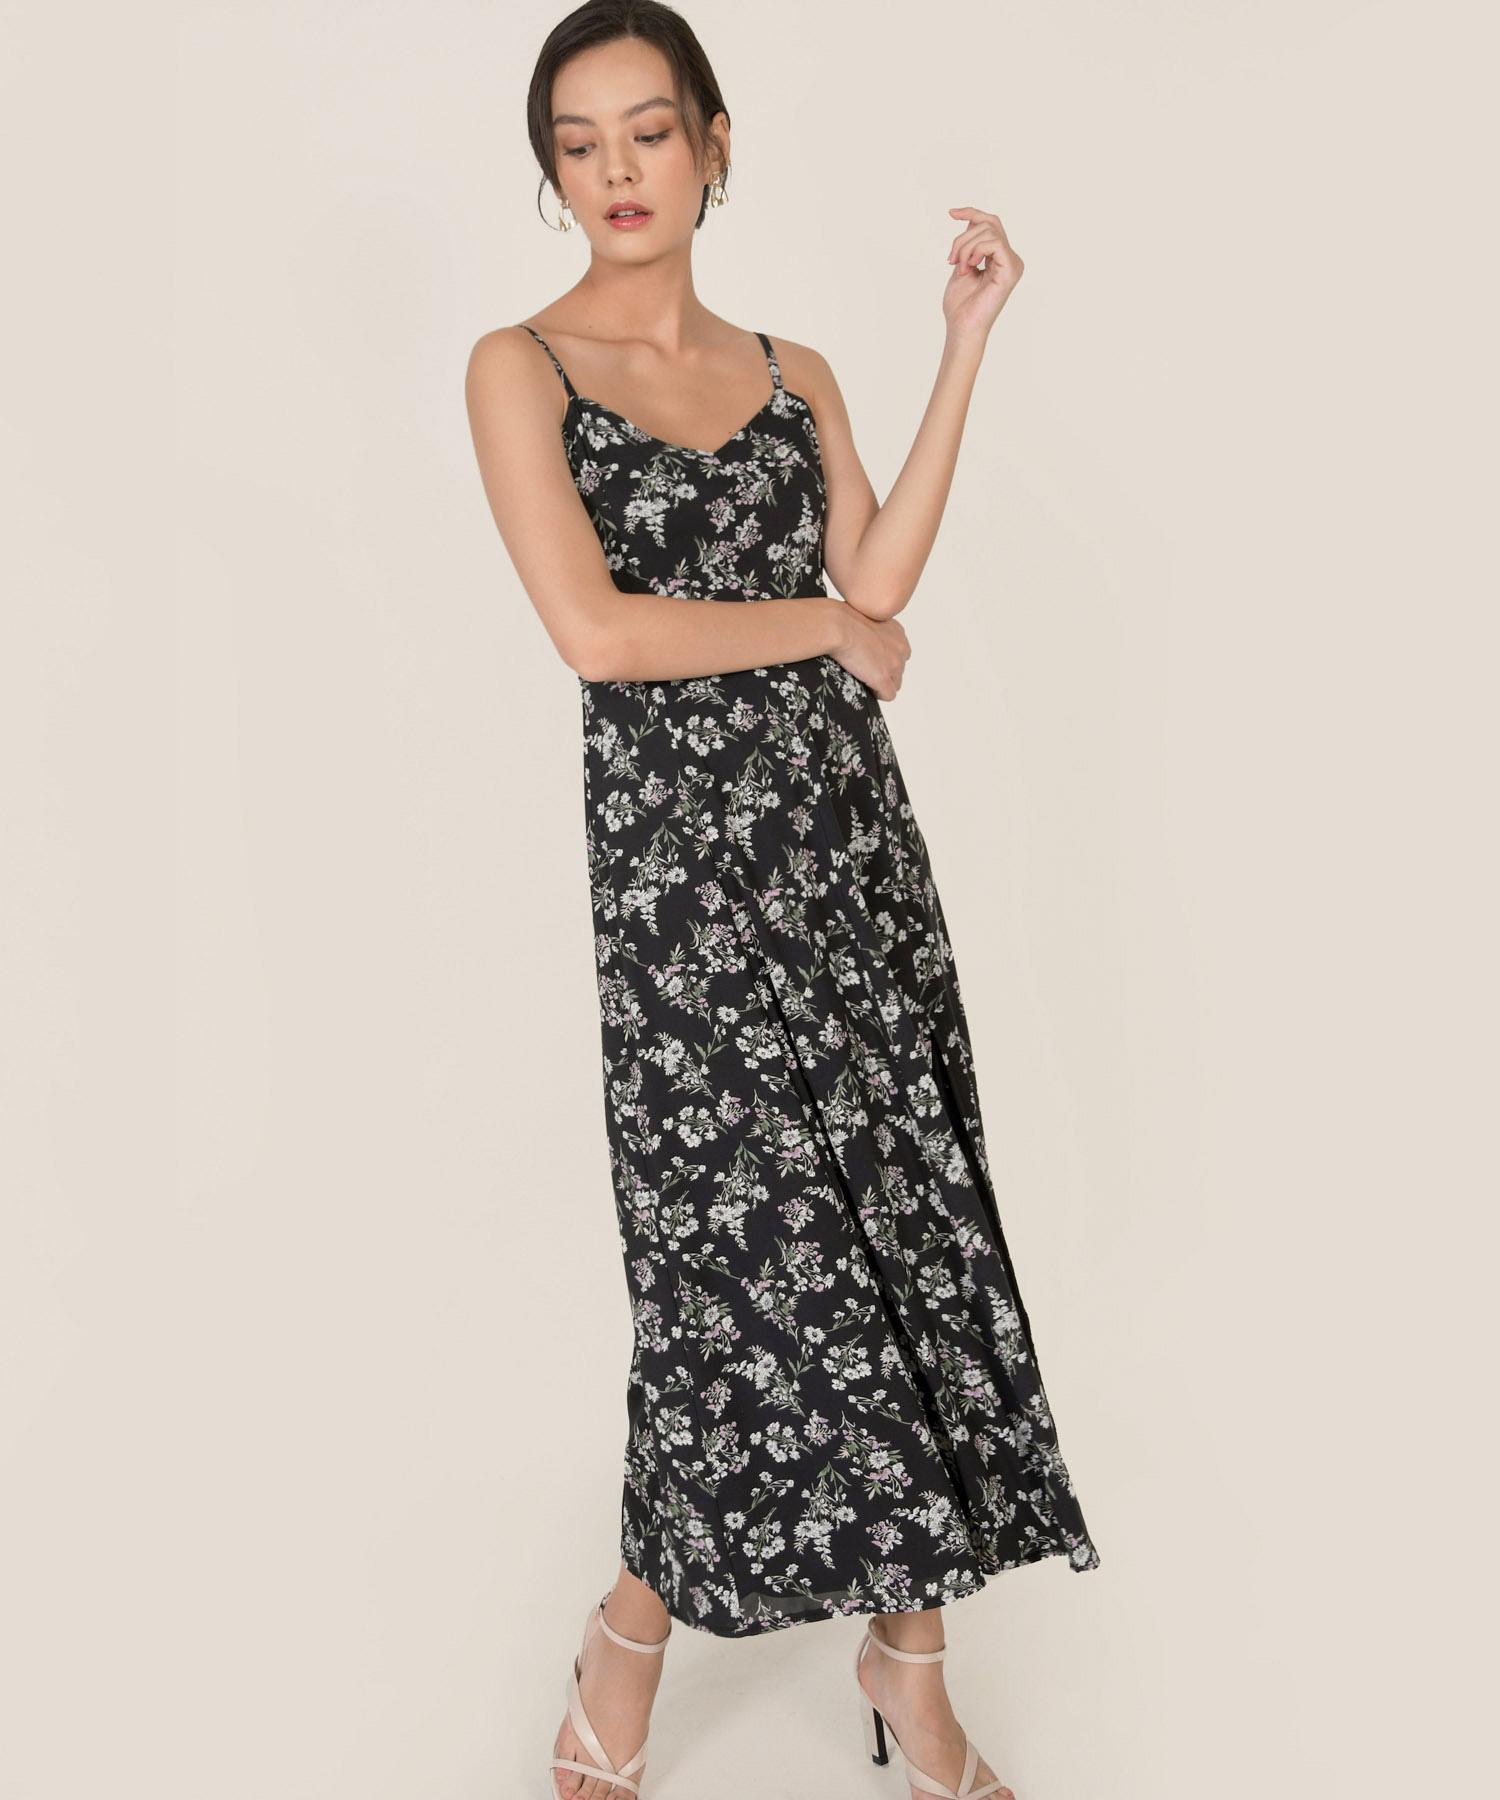 elliot-floral-maxi-dress-black-1